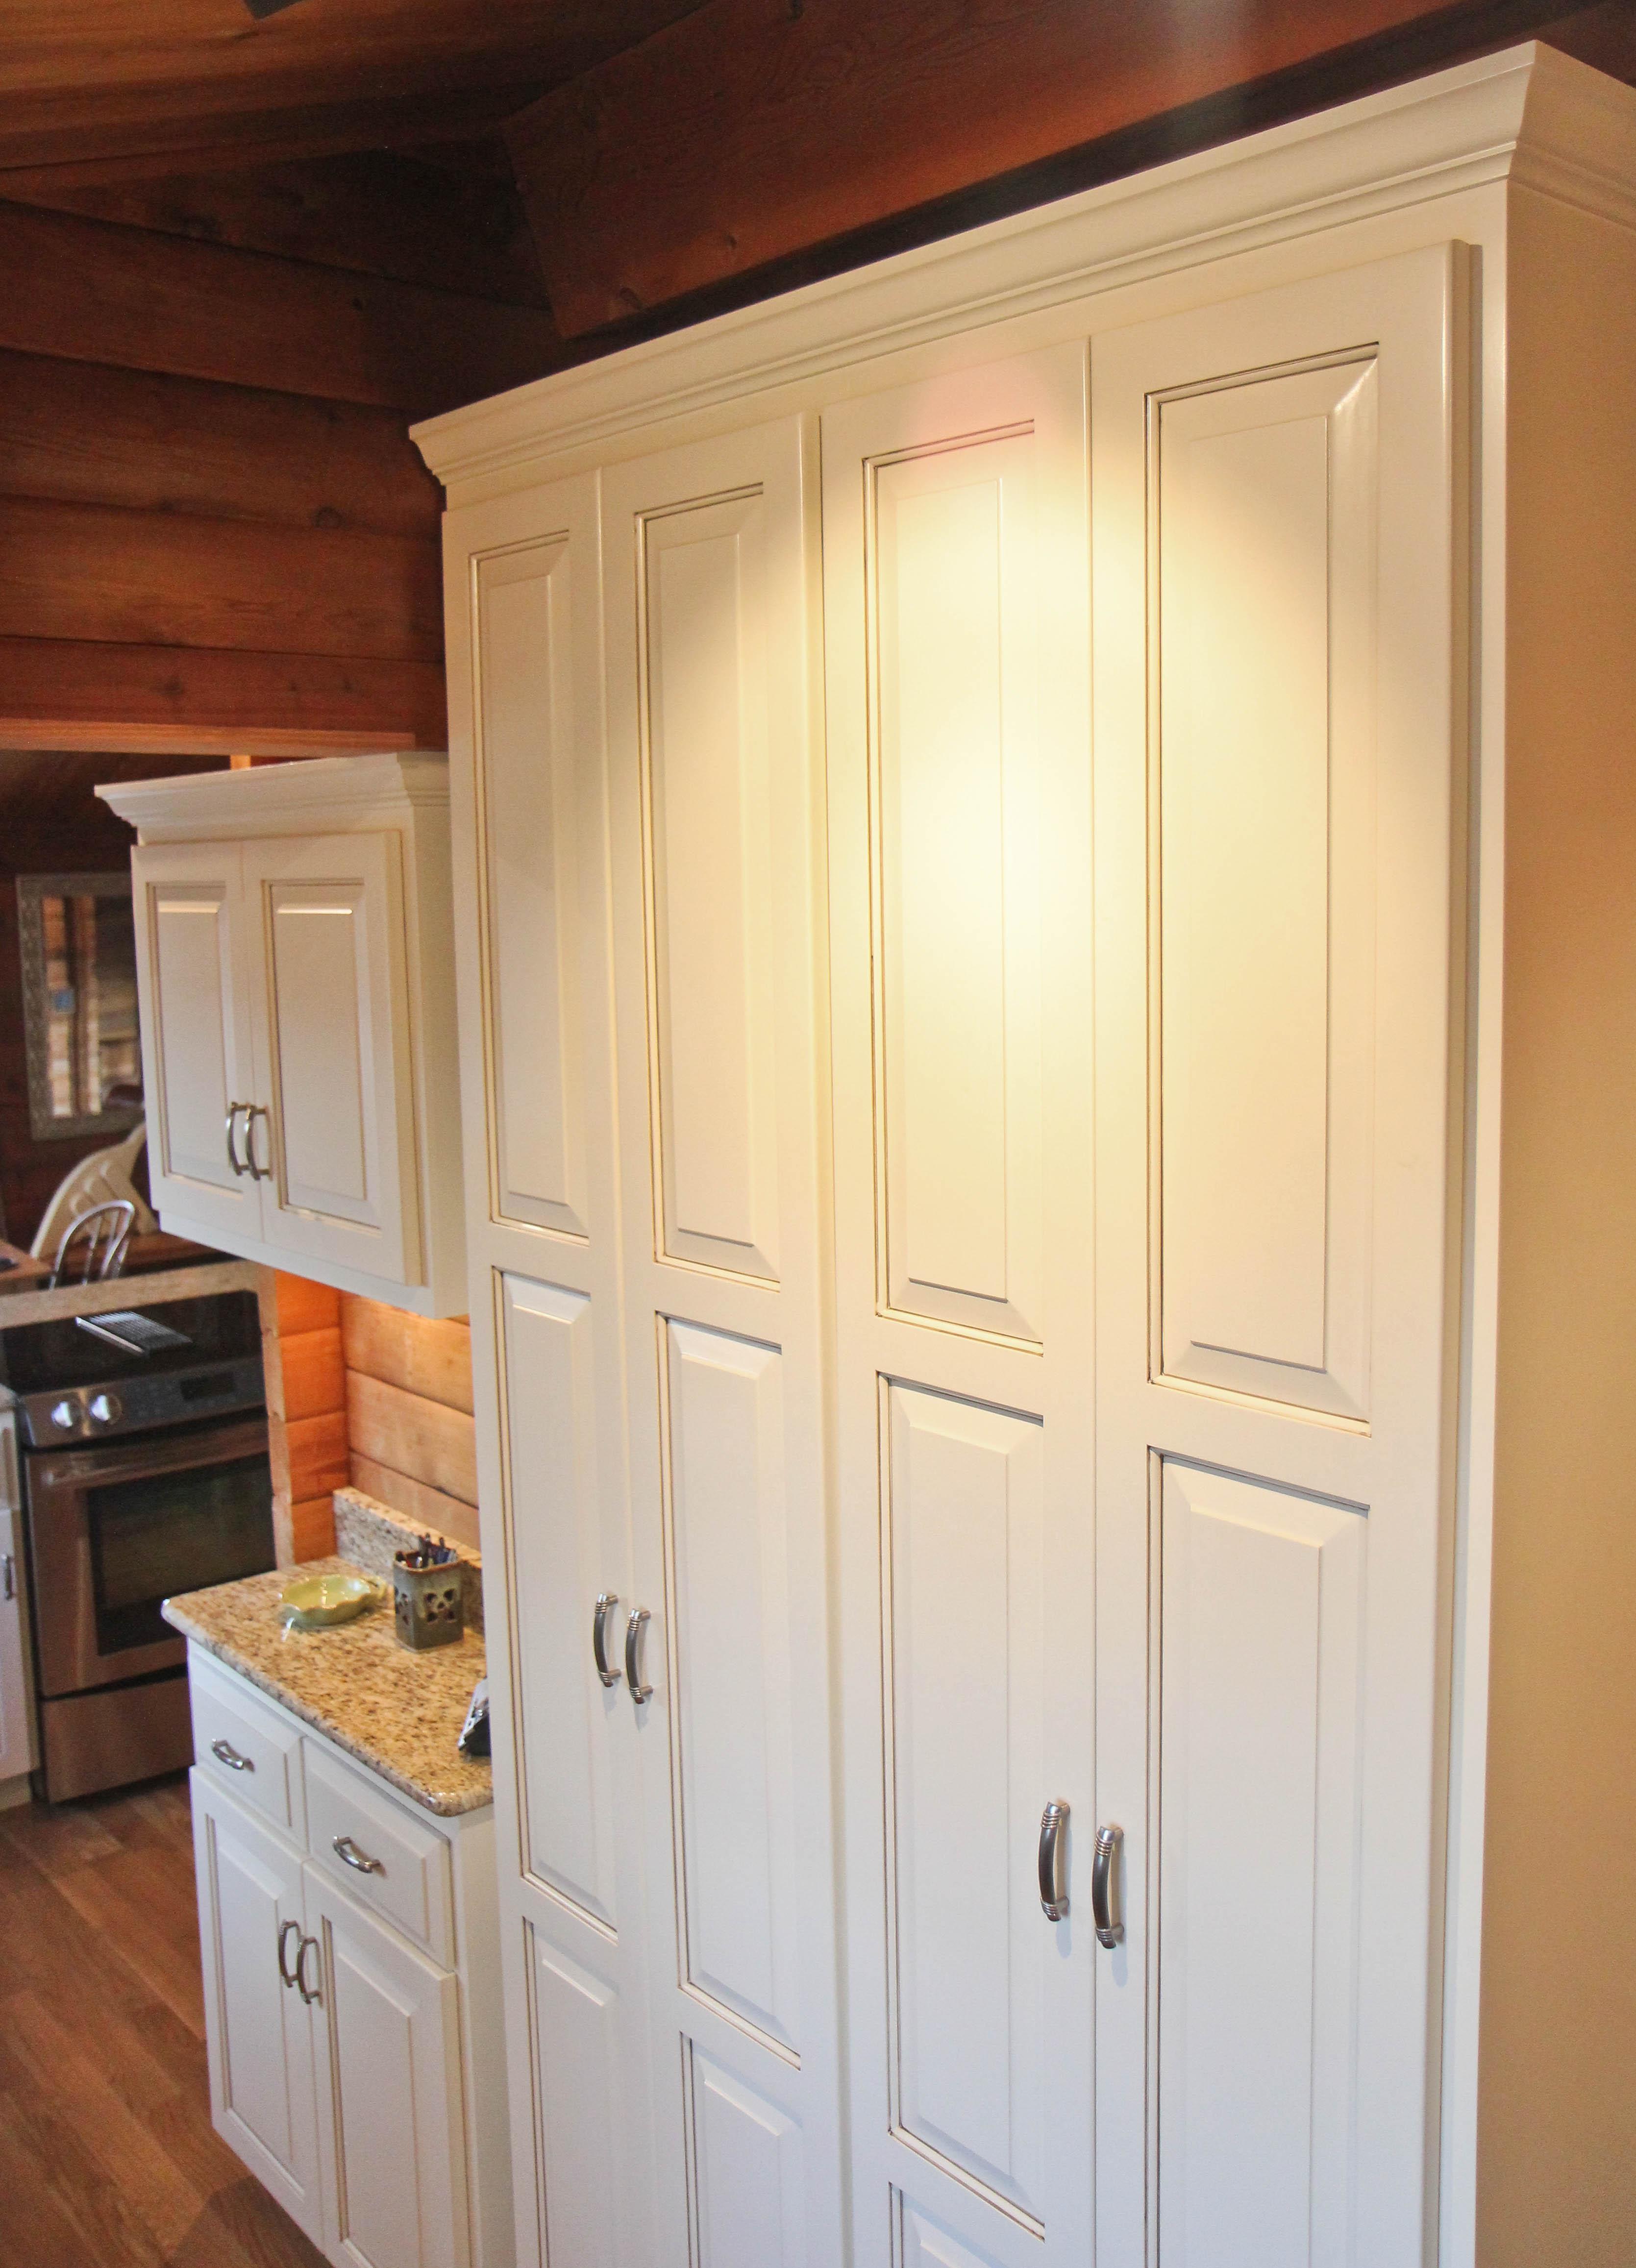 Kitchens pt 2-026.jpg